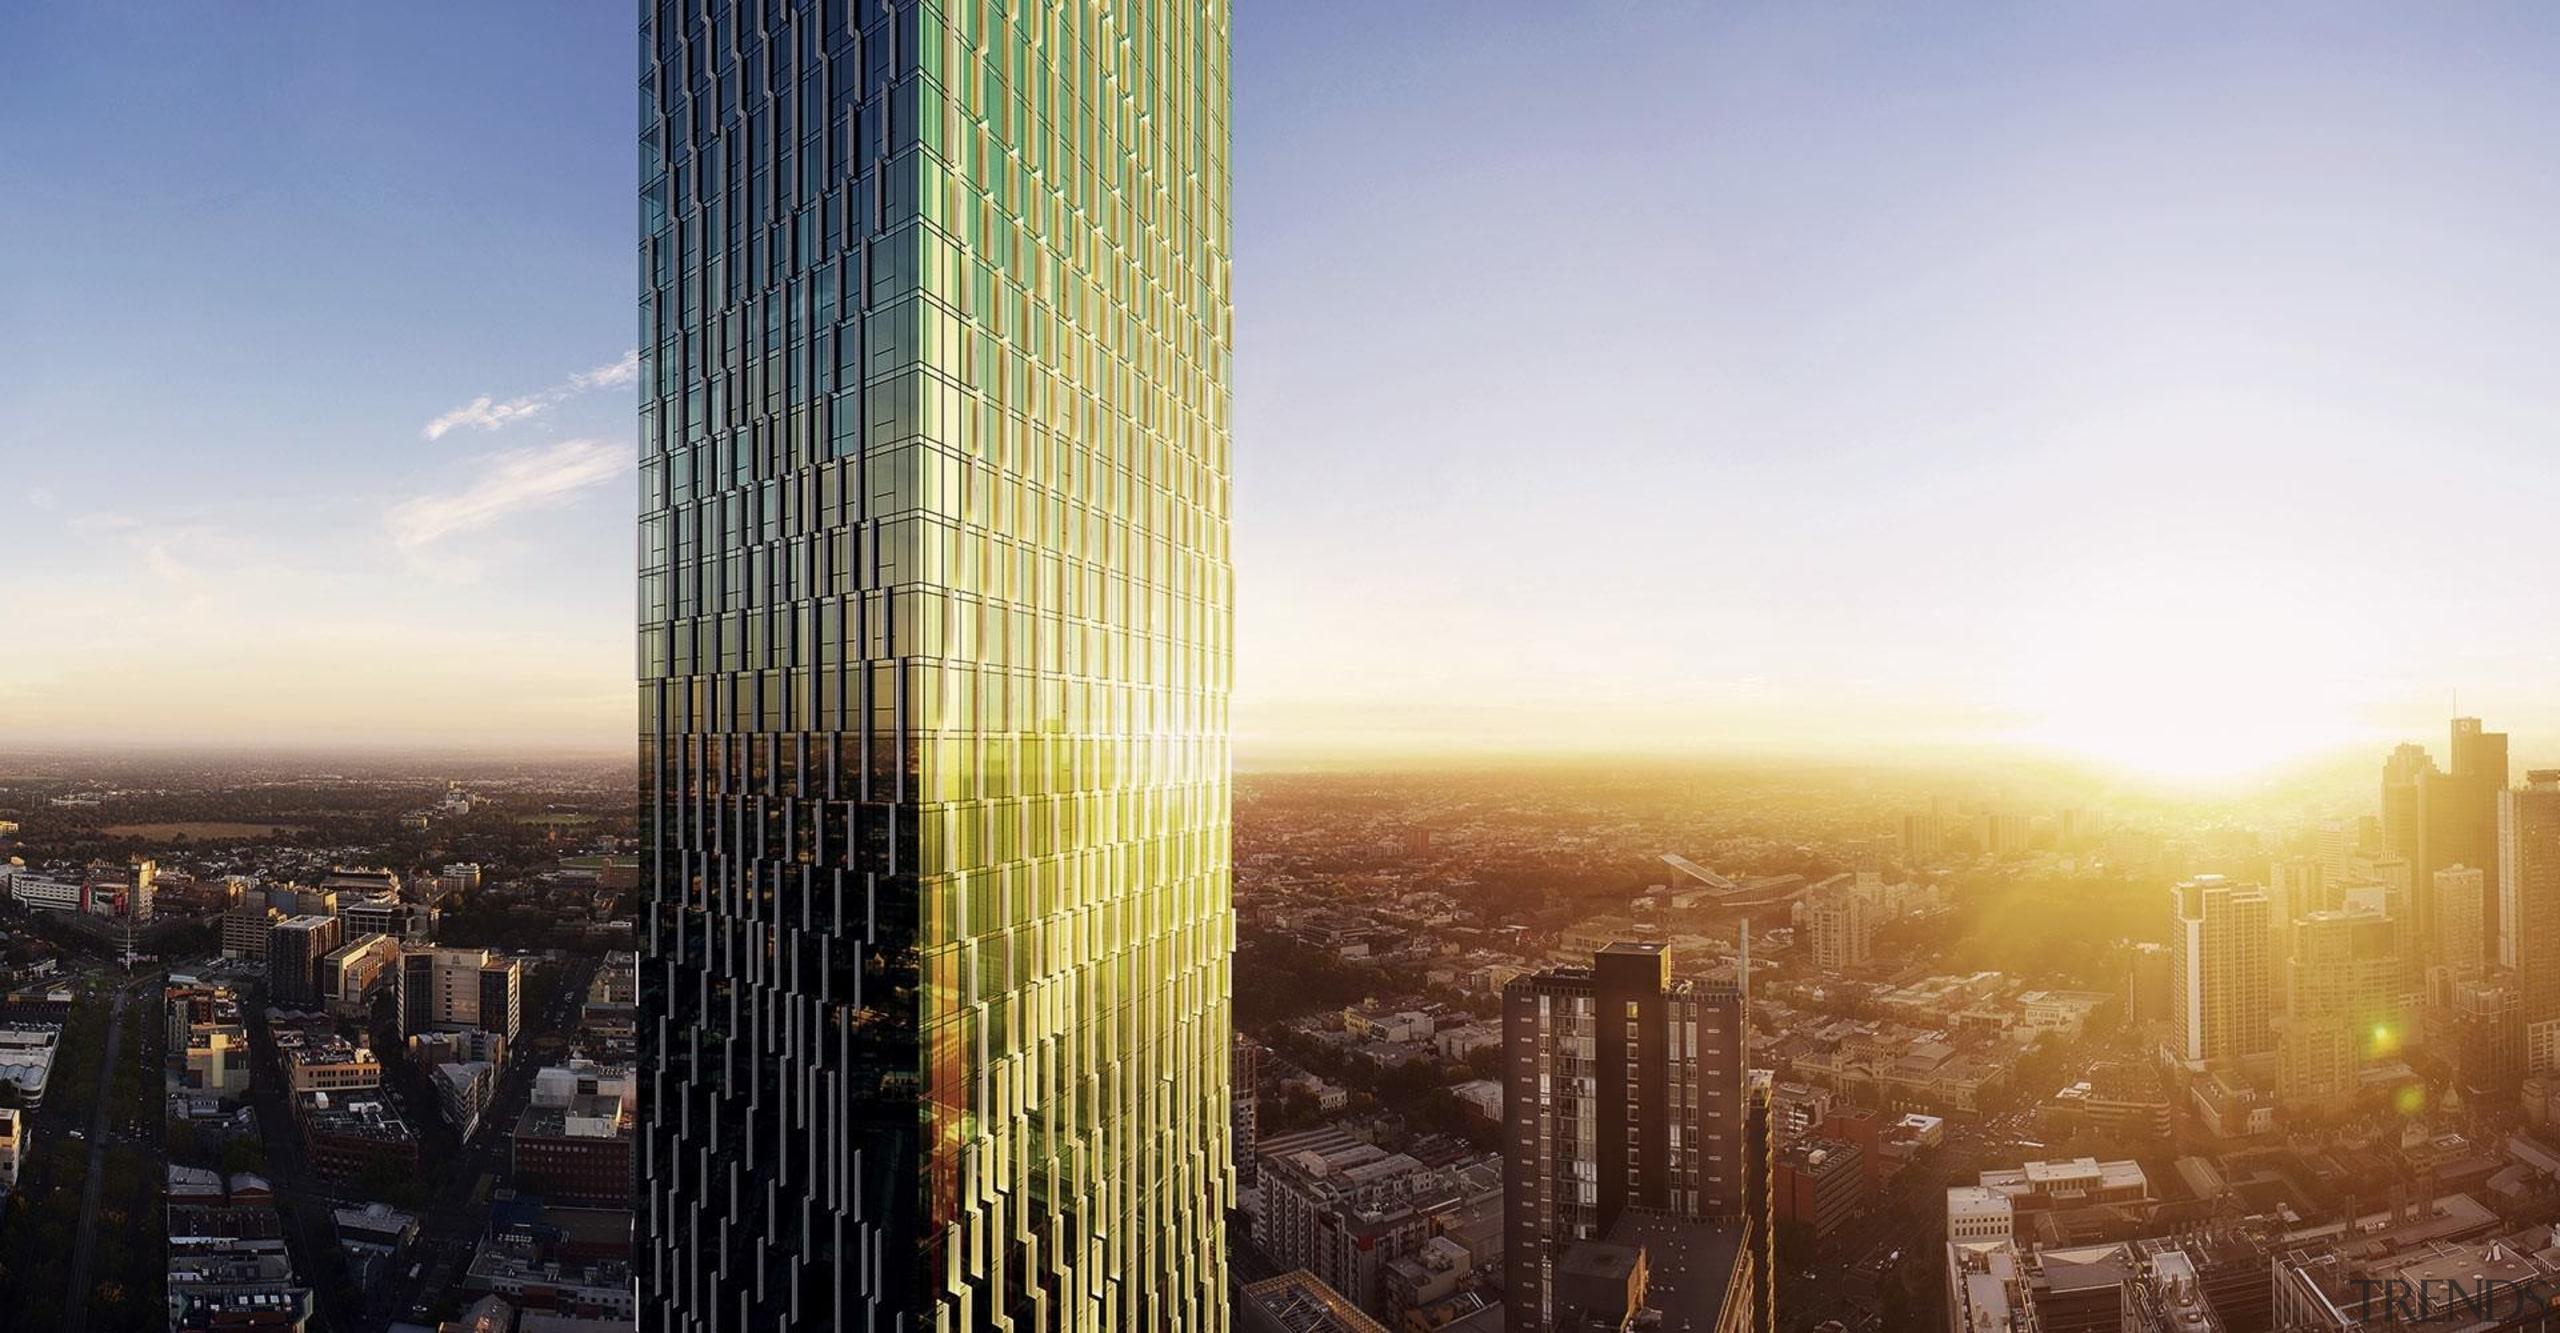 The fins assist with weather and sun protection building, city, cityscape, daytime, landmark, metropolis, metropolitan area, sky, skyline, skyscraper, sunlight, tower, tower block, urban area, gray